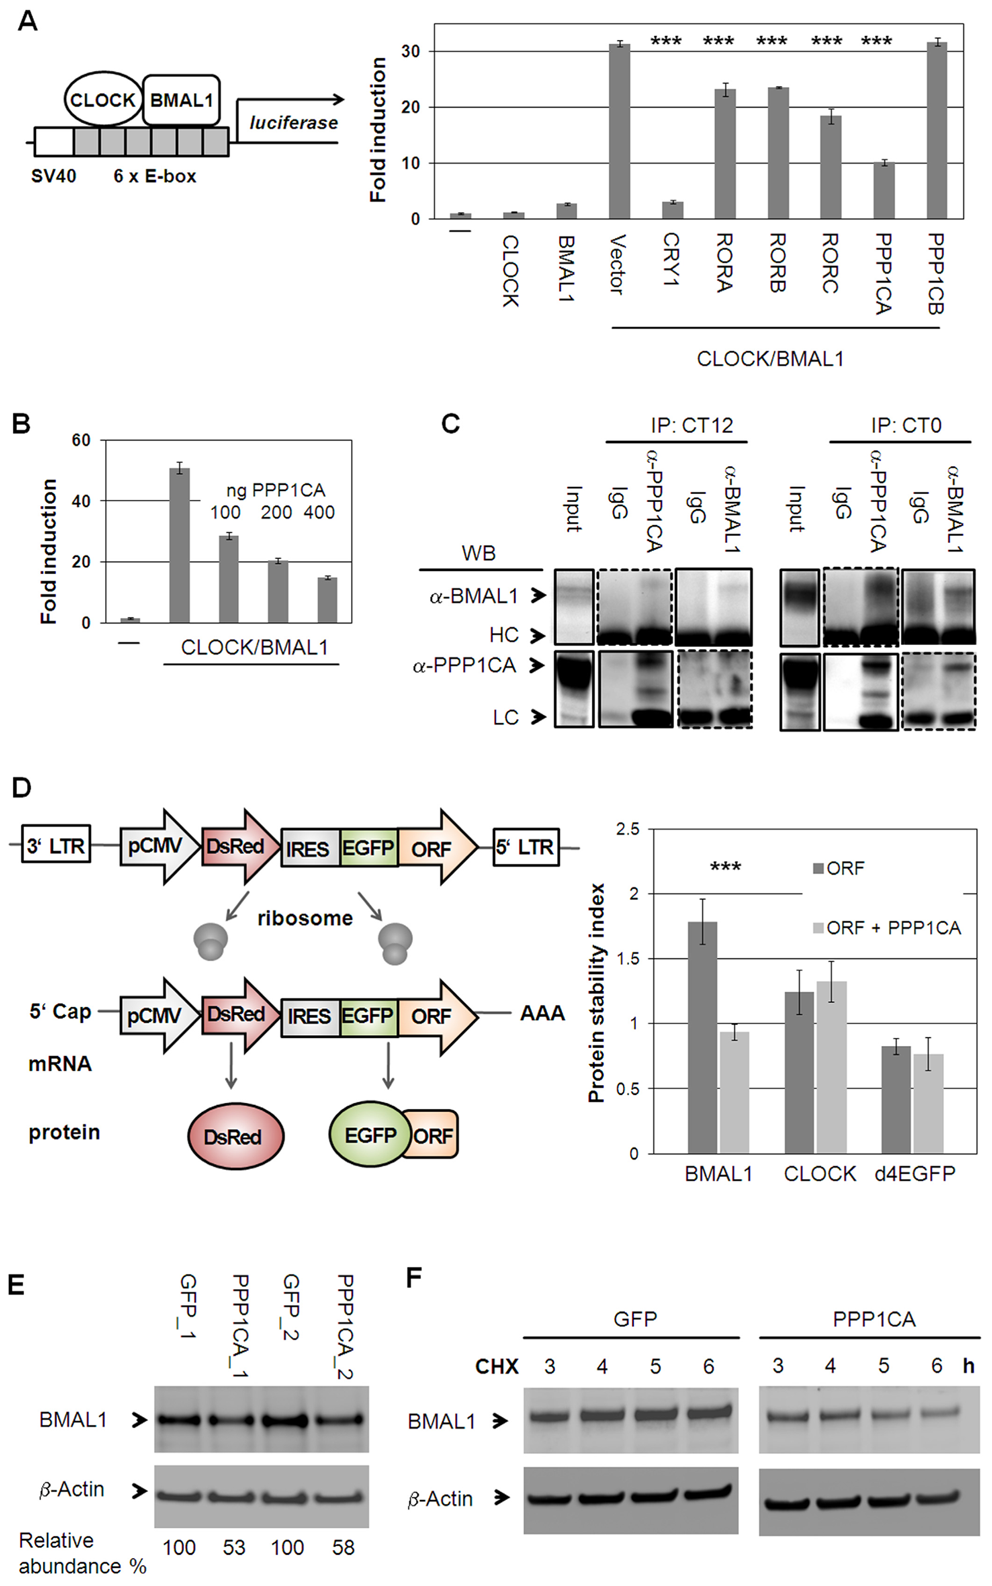 Protein Phosphatase 1 Modulates CLOCK/BMAL1 Function.